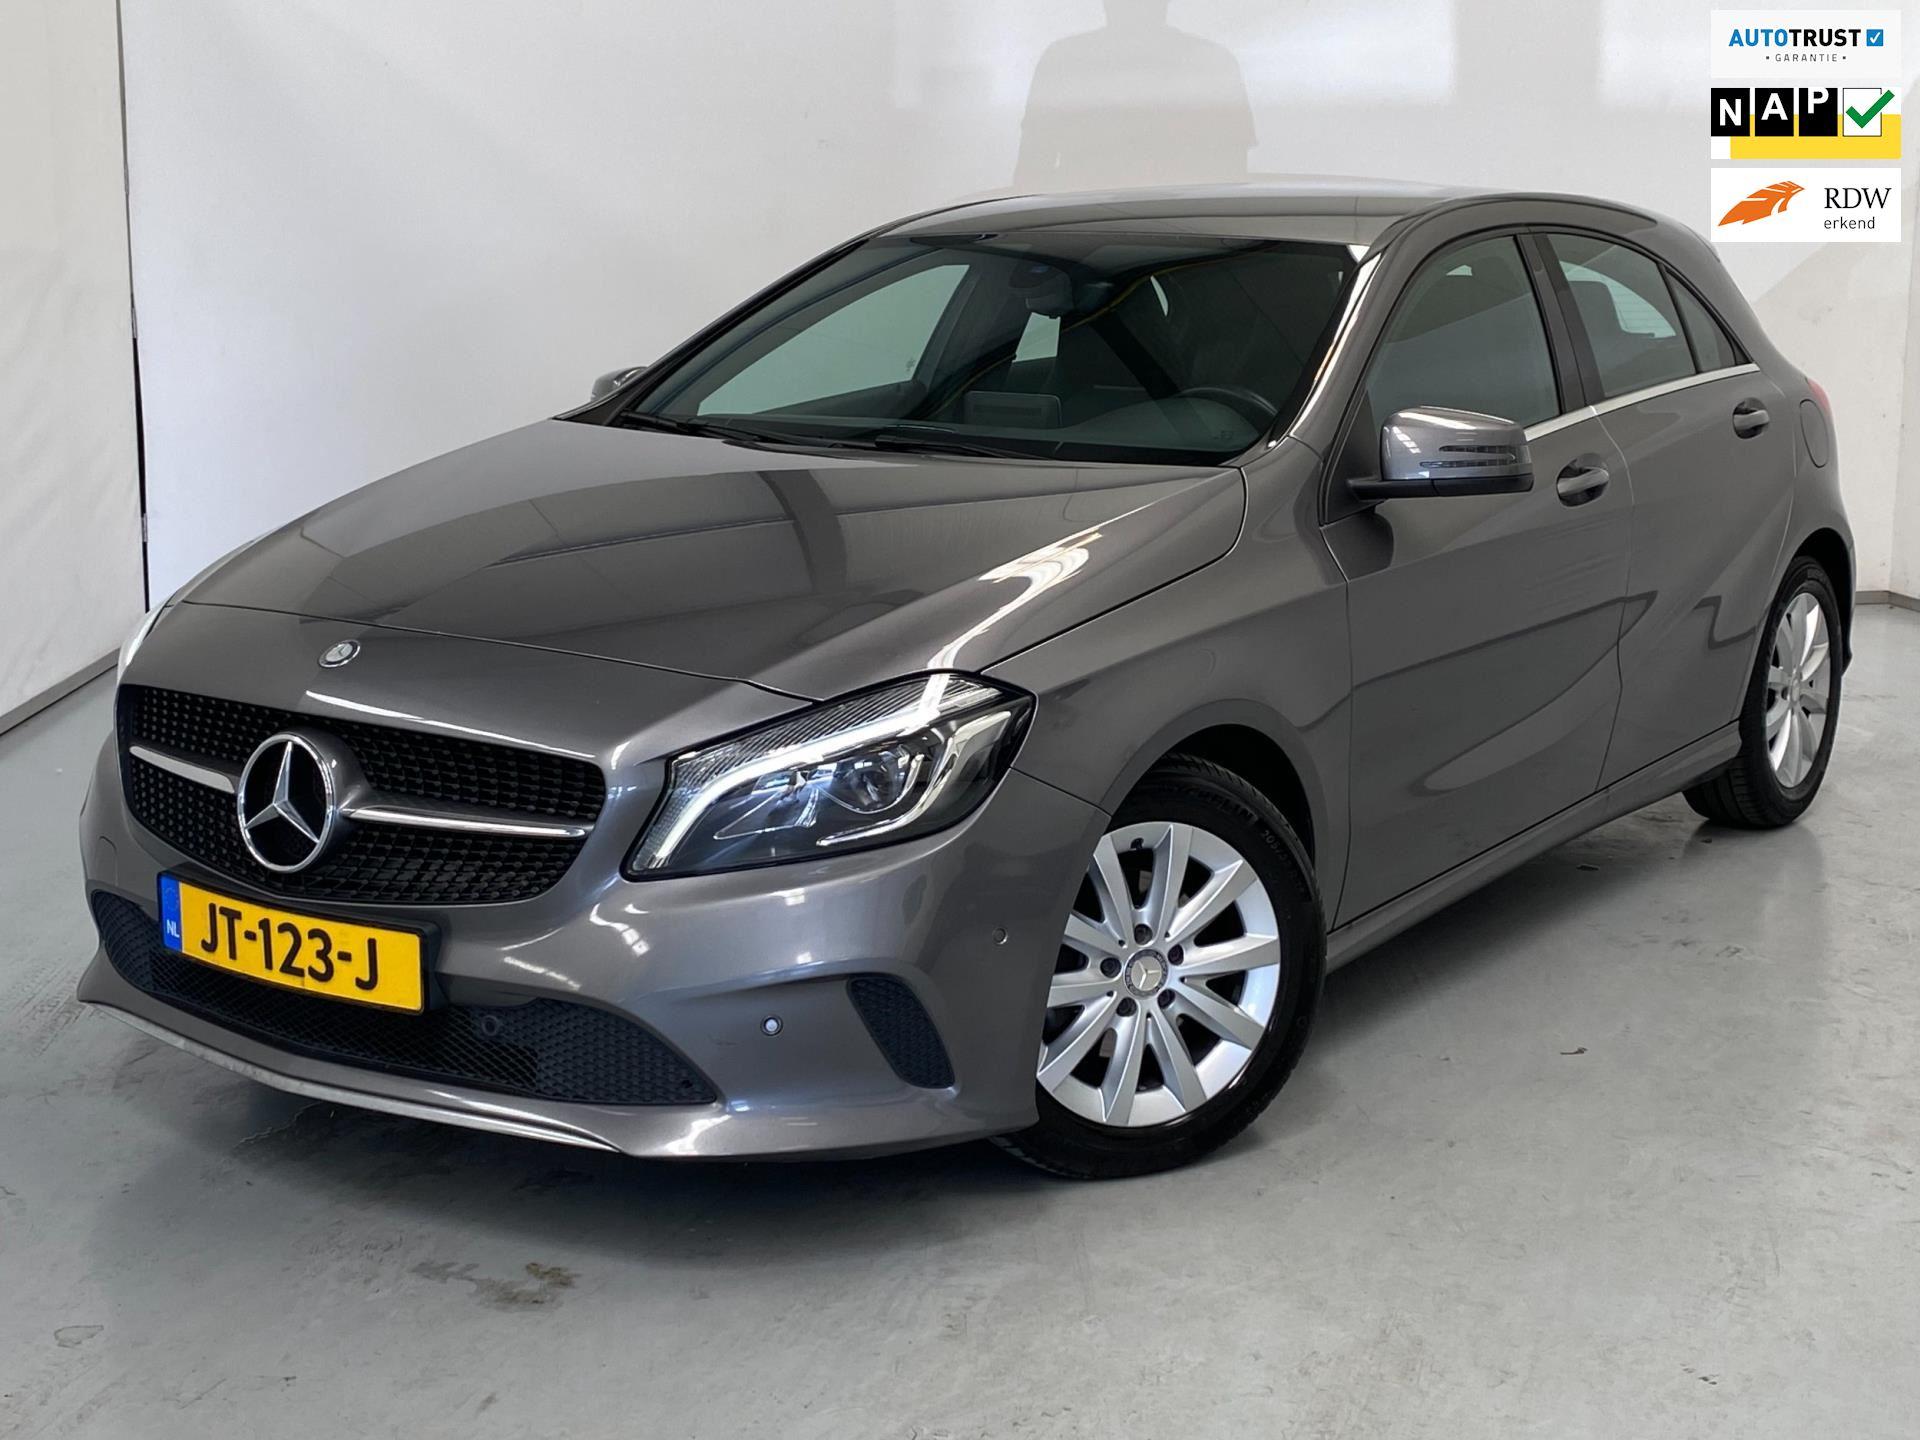 Mercedes-Benz A-klasse occasion - Van den Brink Auto's